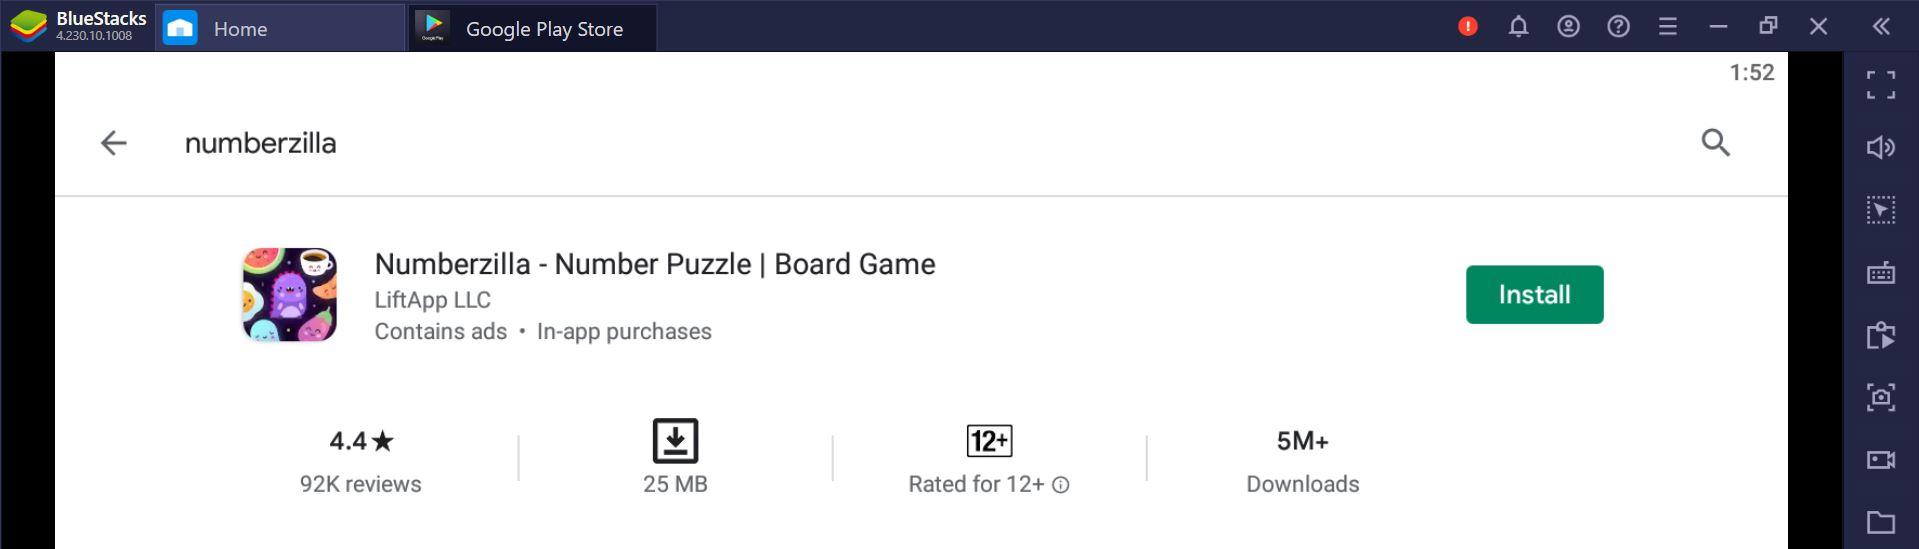 Find Numberzilla App